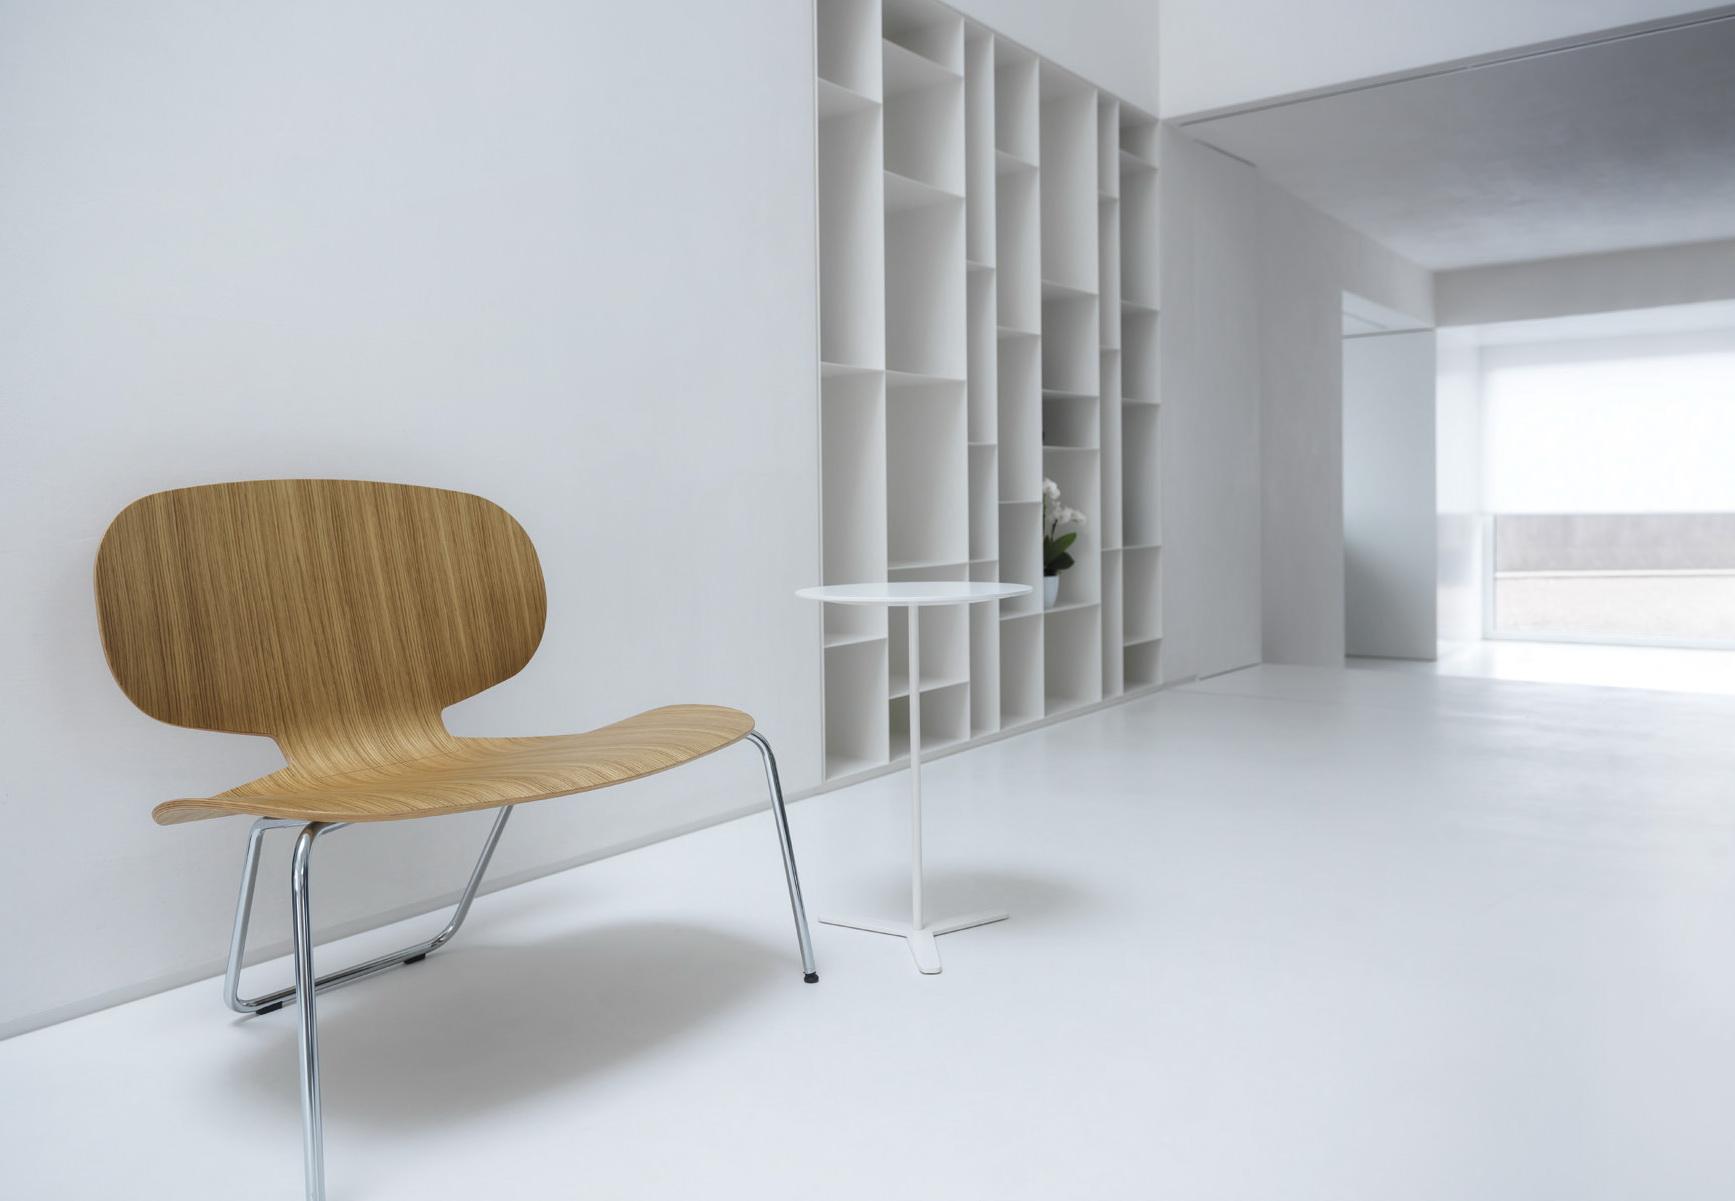 stoel-Alis-crassevig-ENNAIR